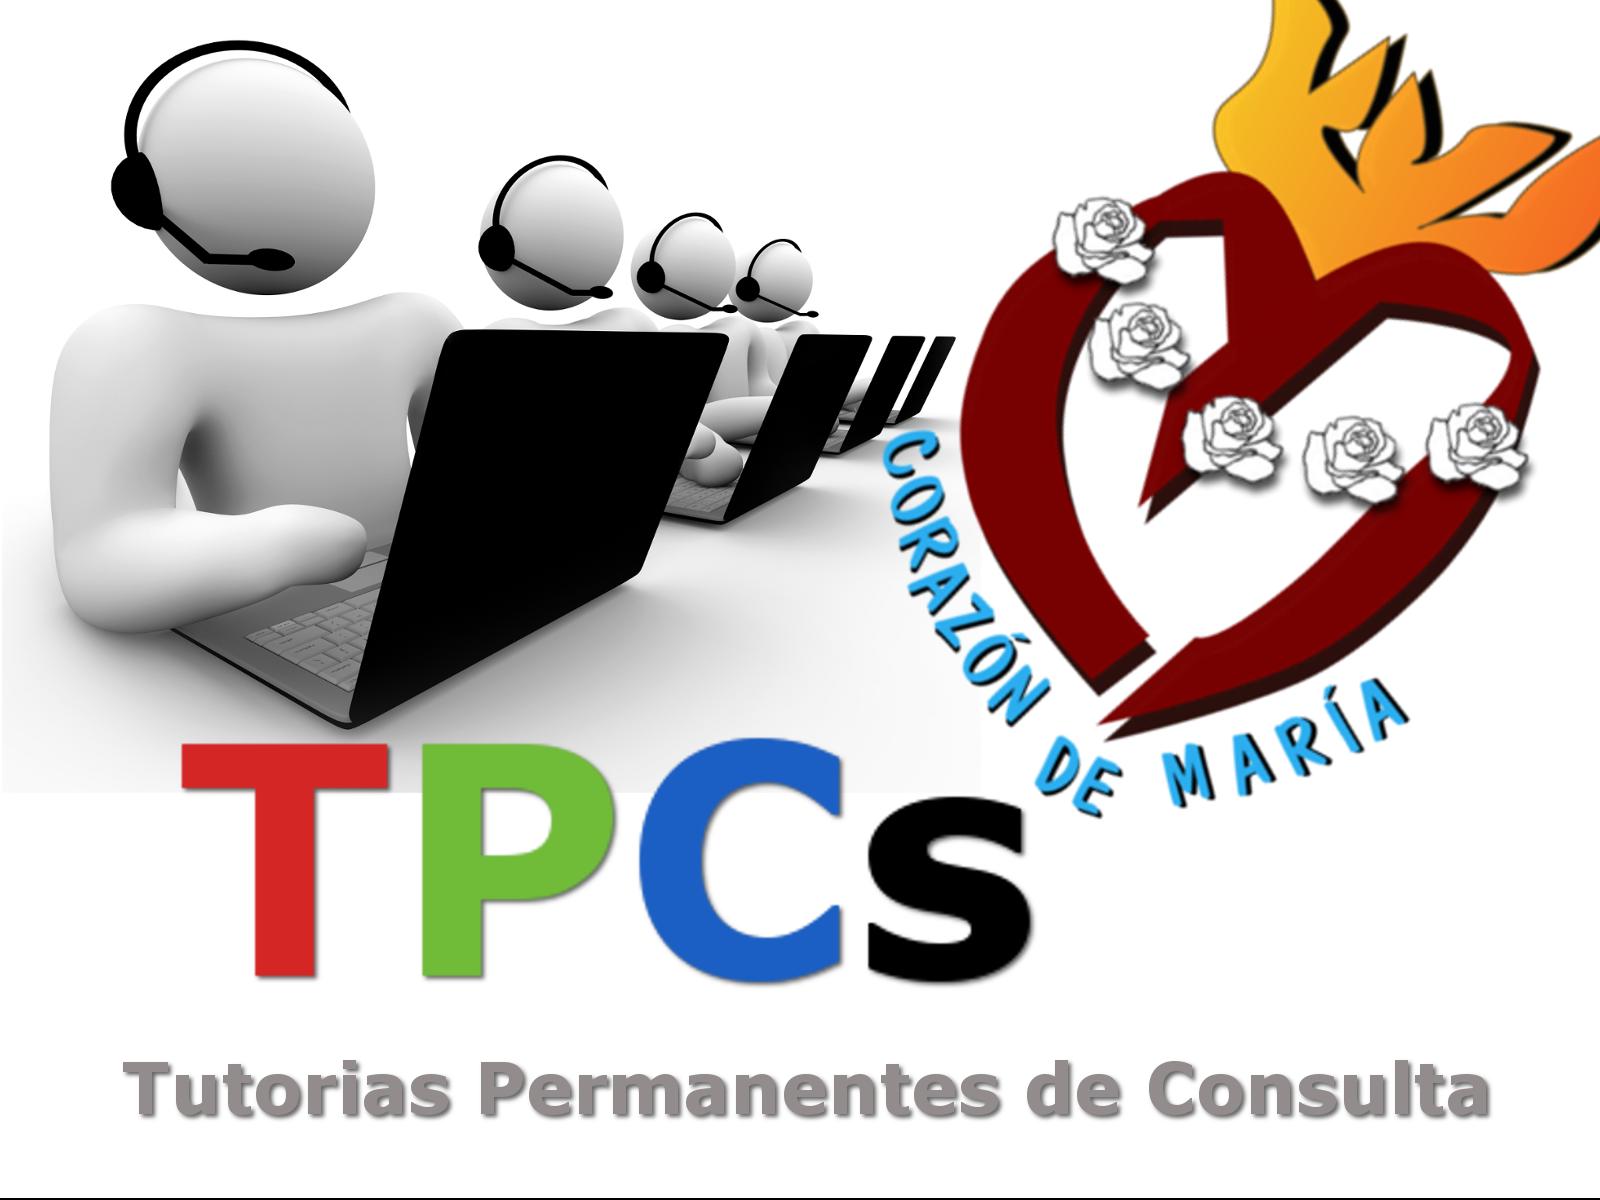 TPC_noticia